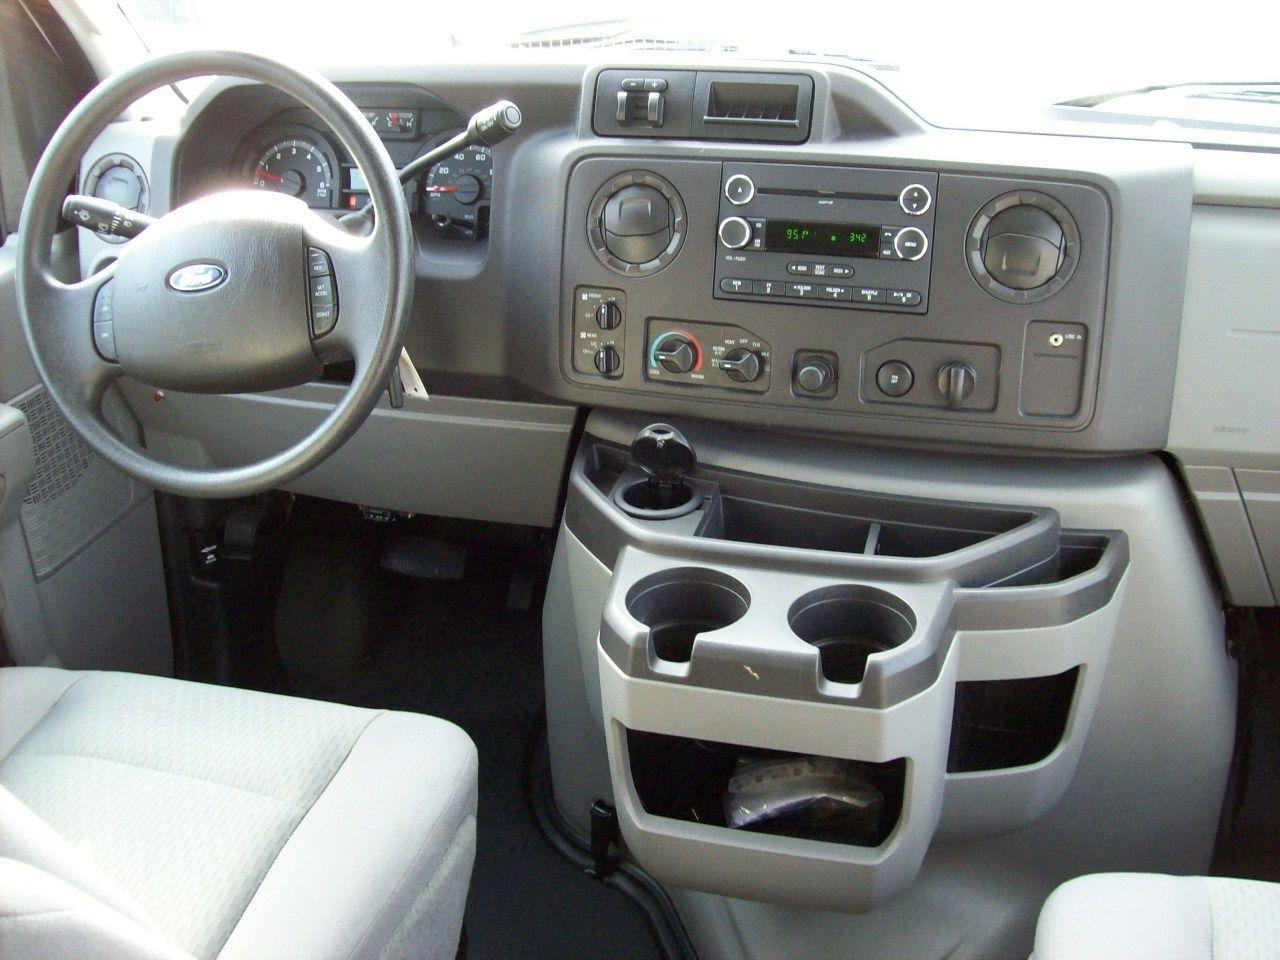 2 X White 2011 Ford E350 Van W Quadvan Conversion Sold 4x4 Van